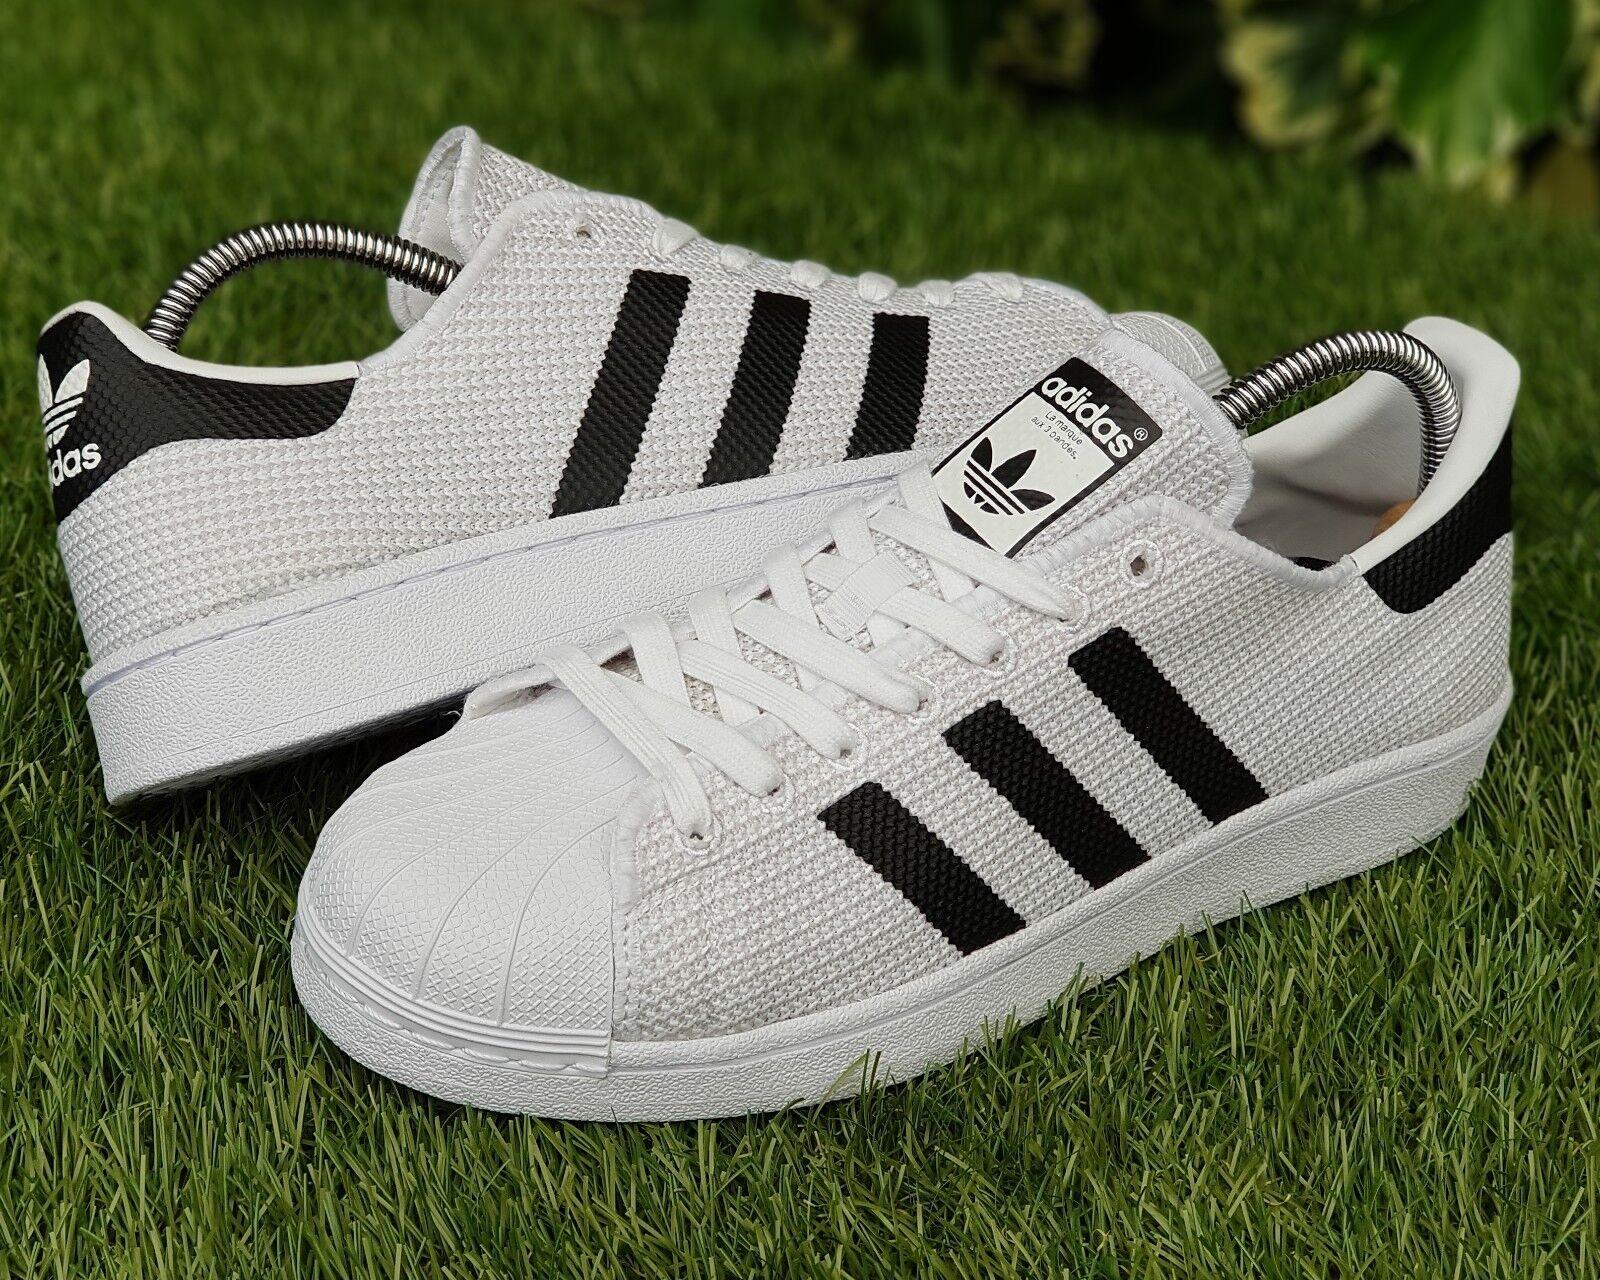 BNWB & Authentc adidas originals ® Superstar  Two Tone Mesh  Trainers UK Größe 8